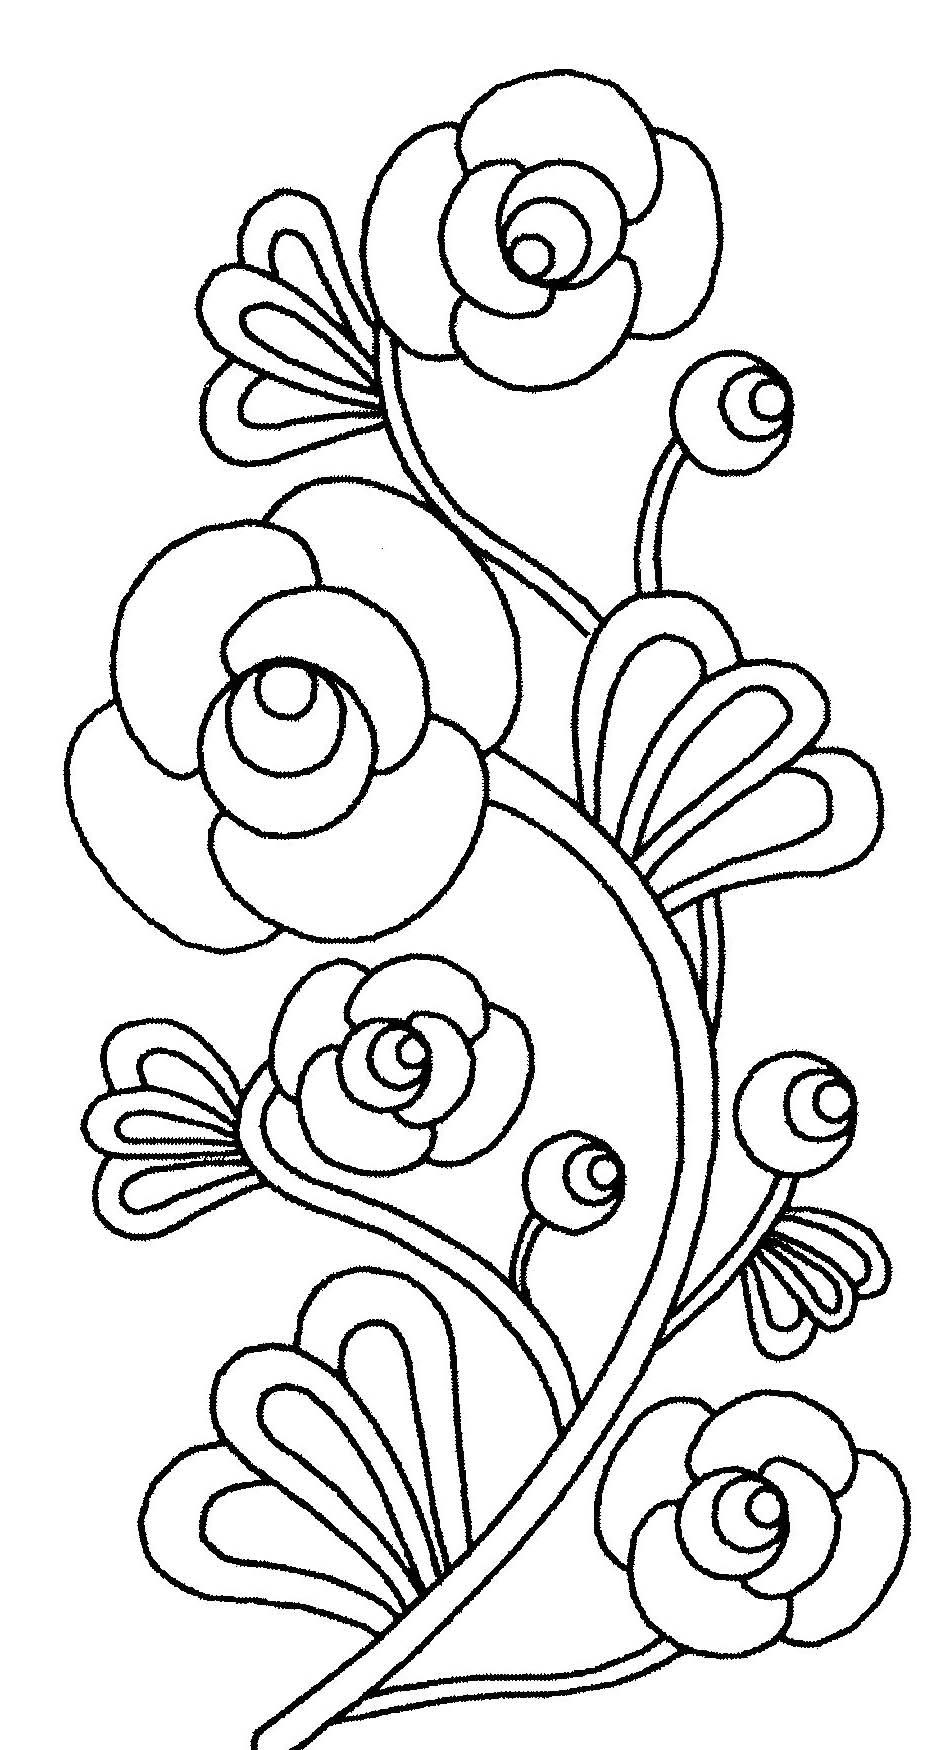 74 Dibujos De Flores Para Colorear Oh Kids Page 8